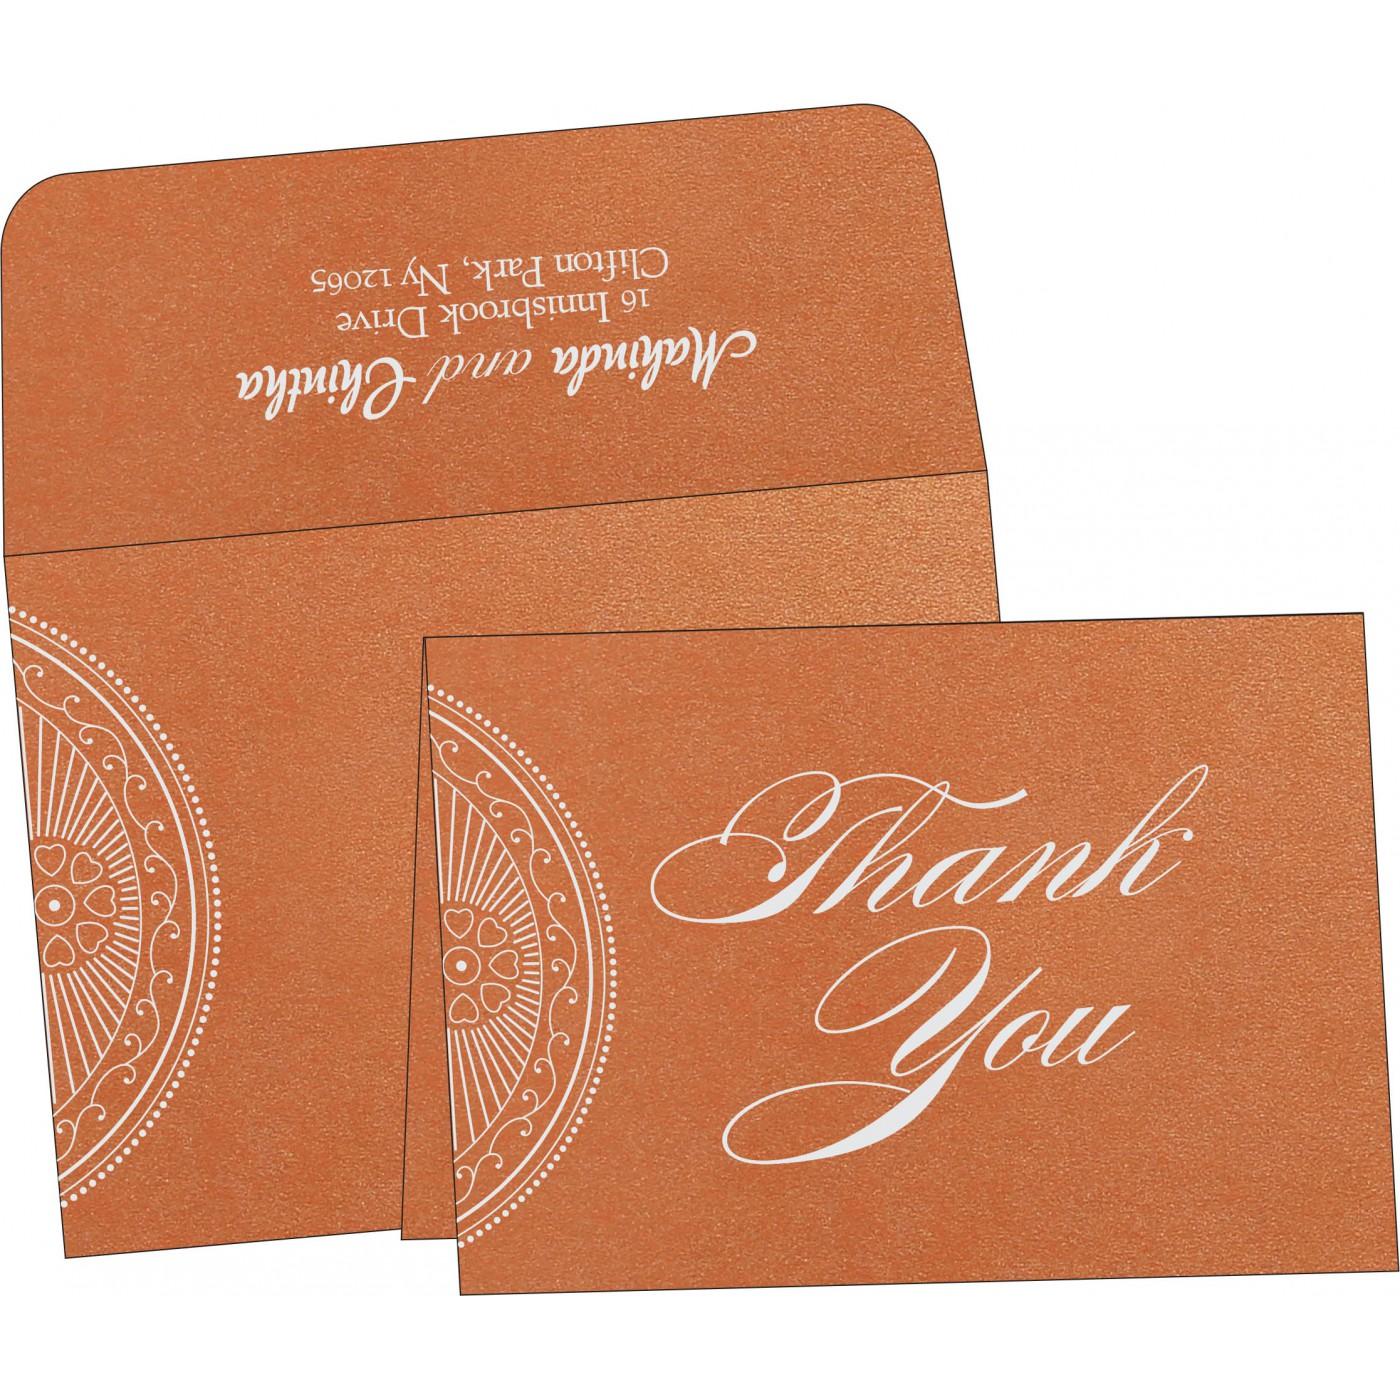 Thank You Cards : TYC-8230T - 123WeddingCards